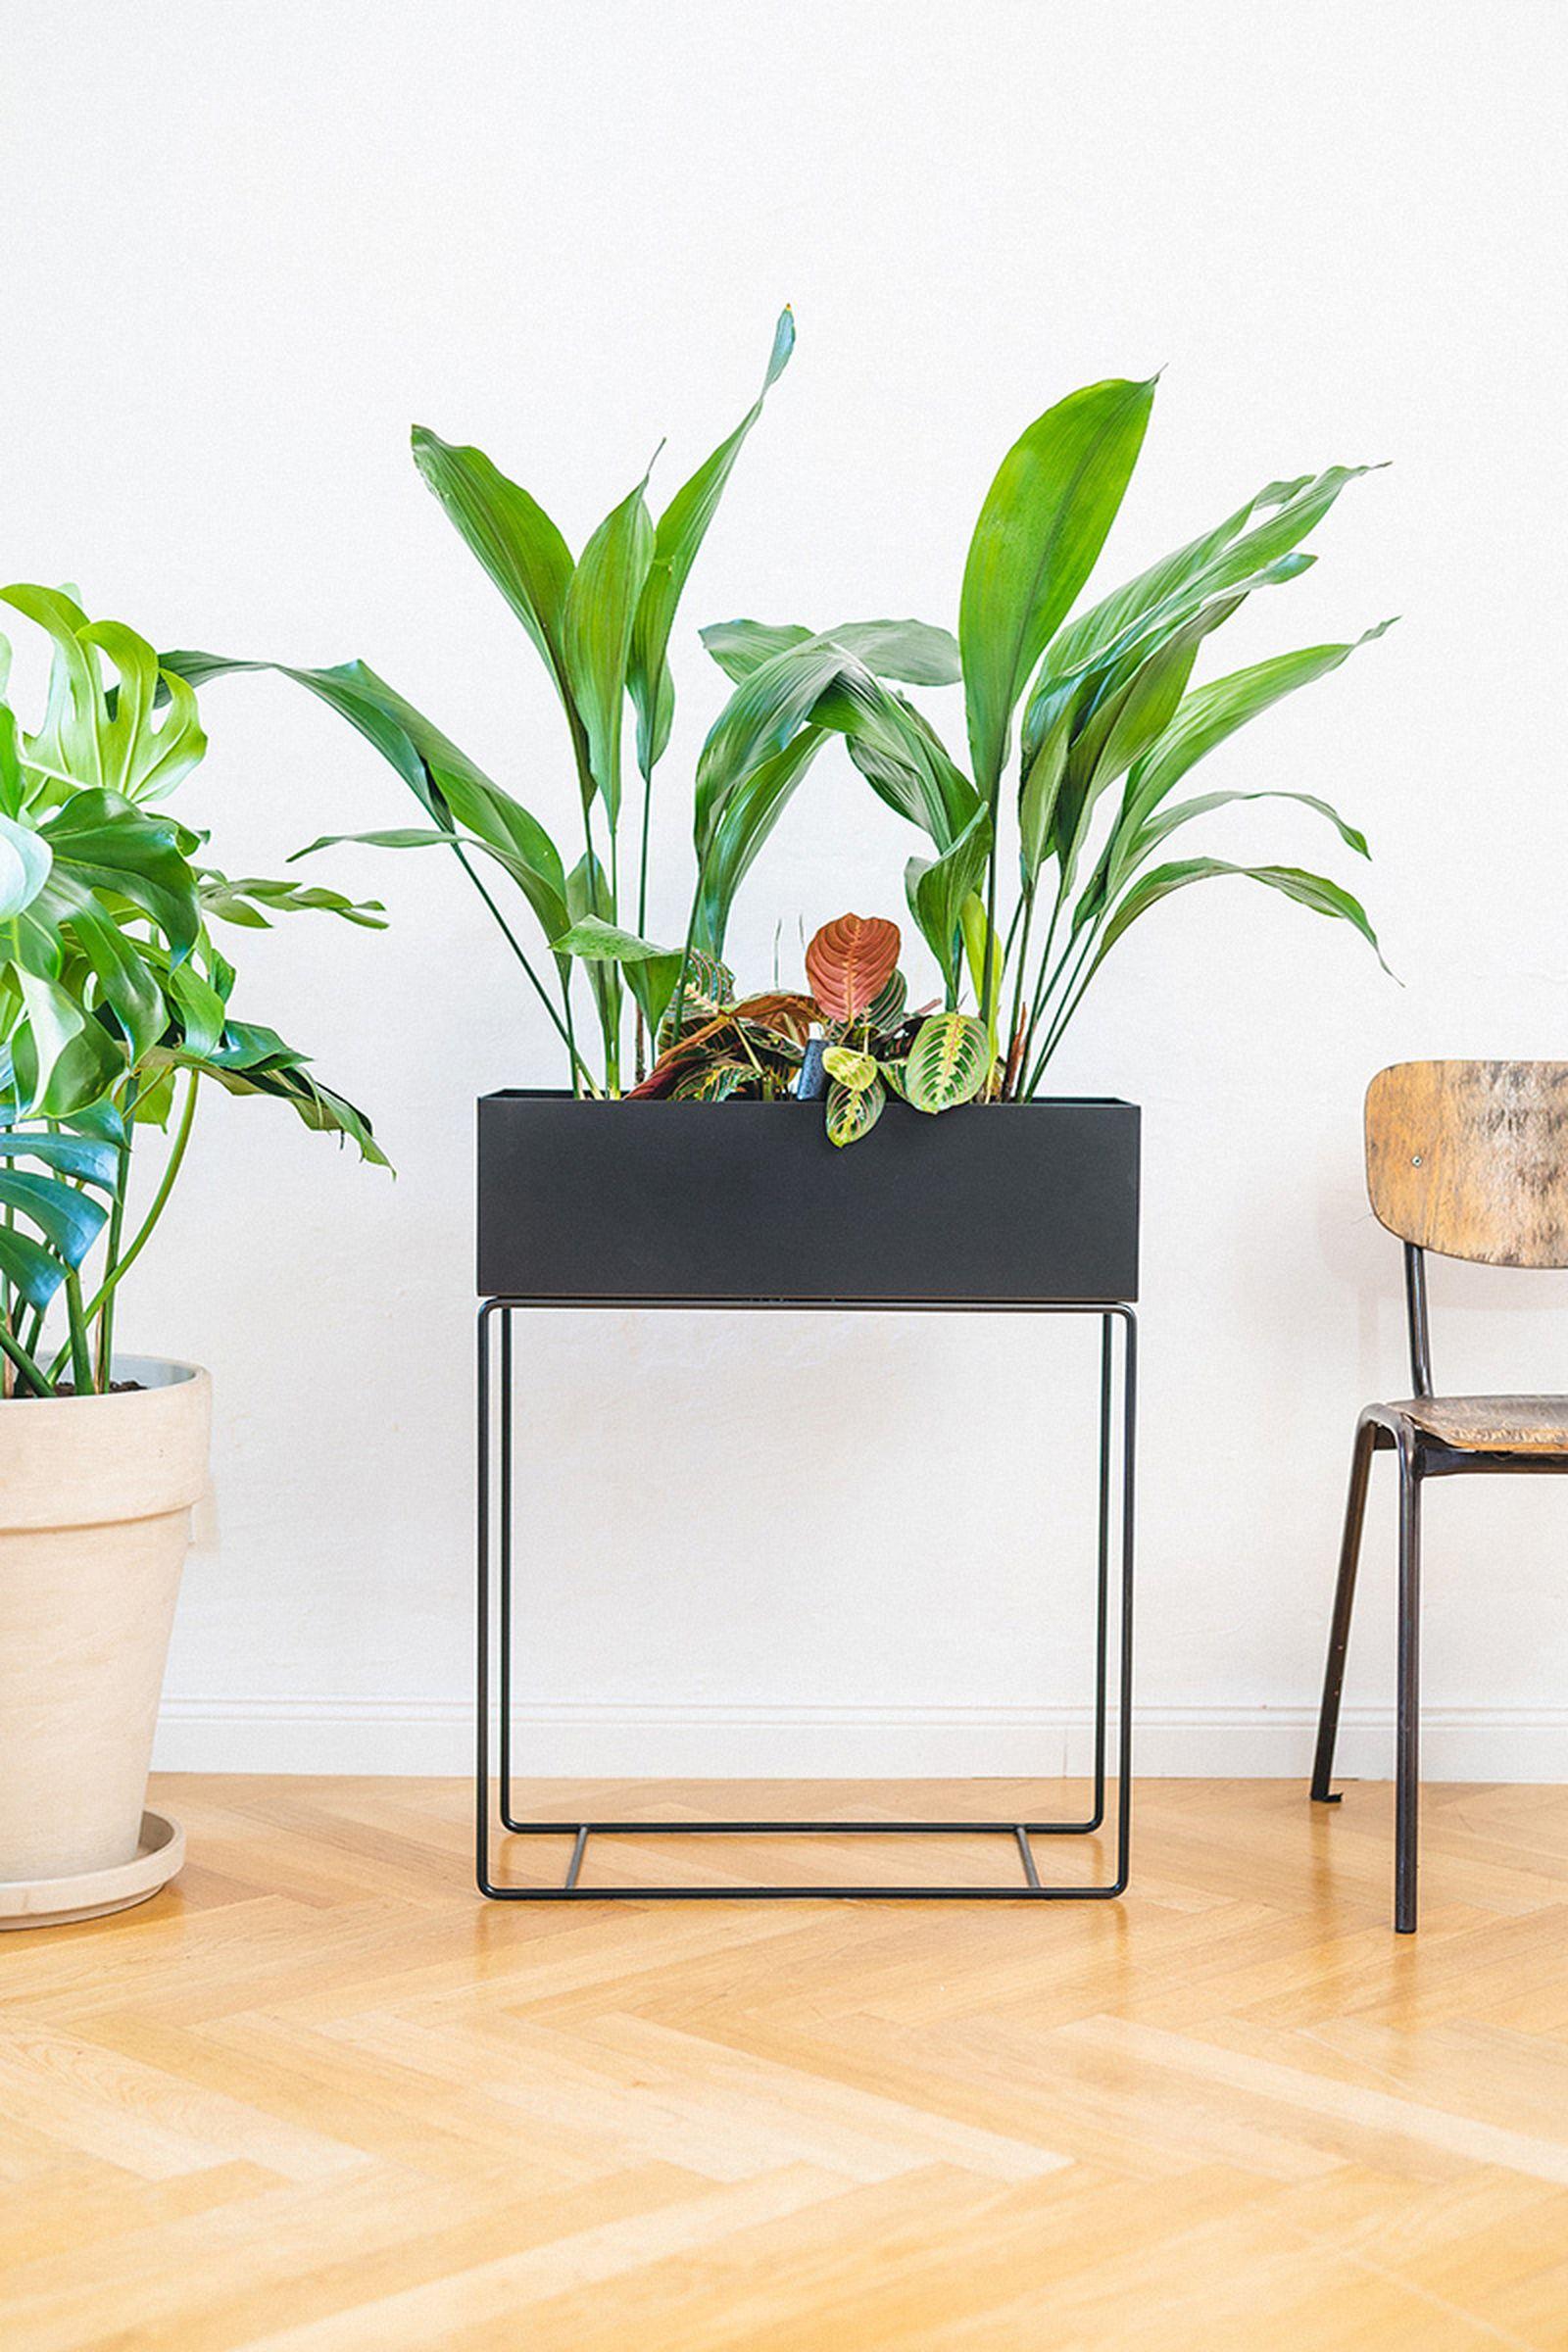 easy-house-plants-for-beginners-13